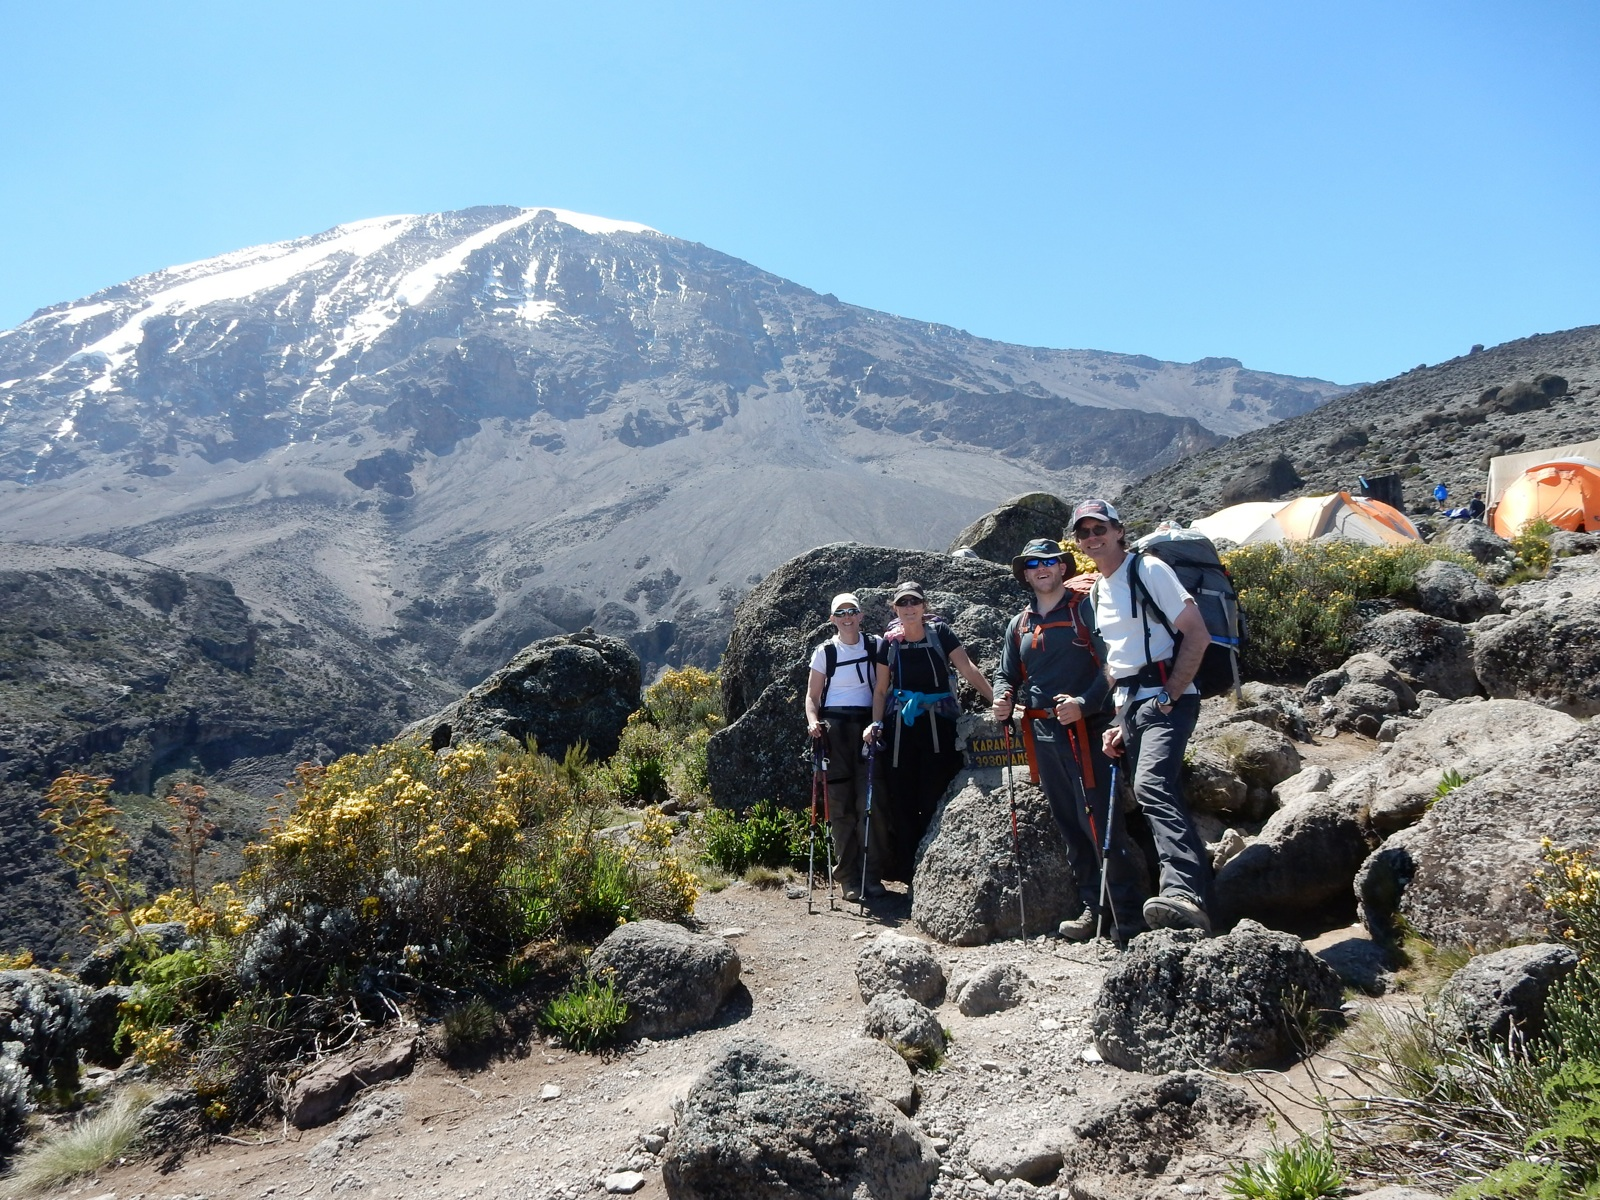 IMG Kili climbers arrive at Karanga Camp (Craig John)